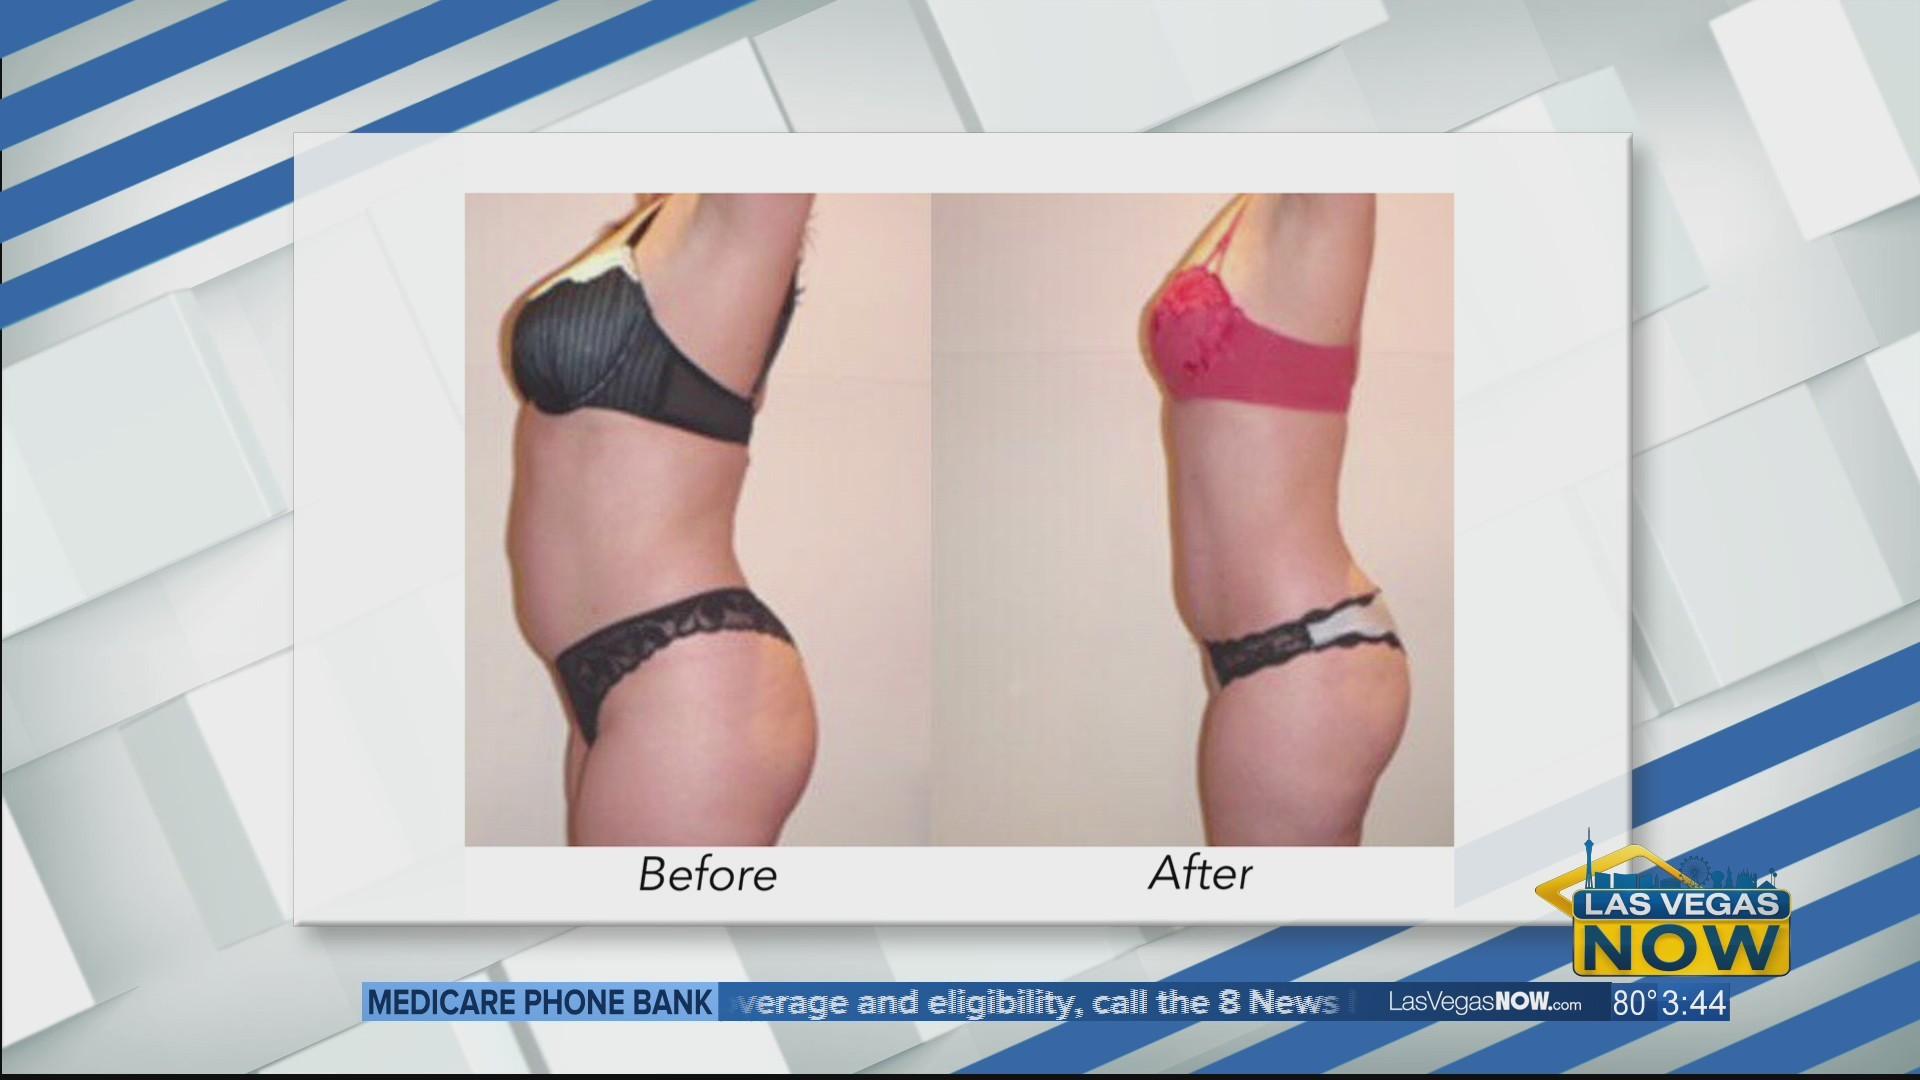 Full body bio-stimulation treatment with VJazzy Wellness